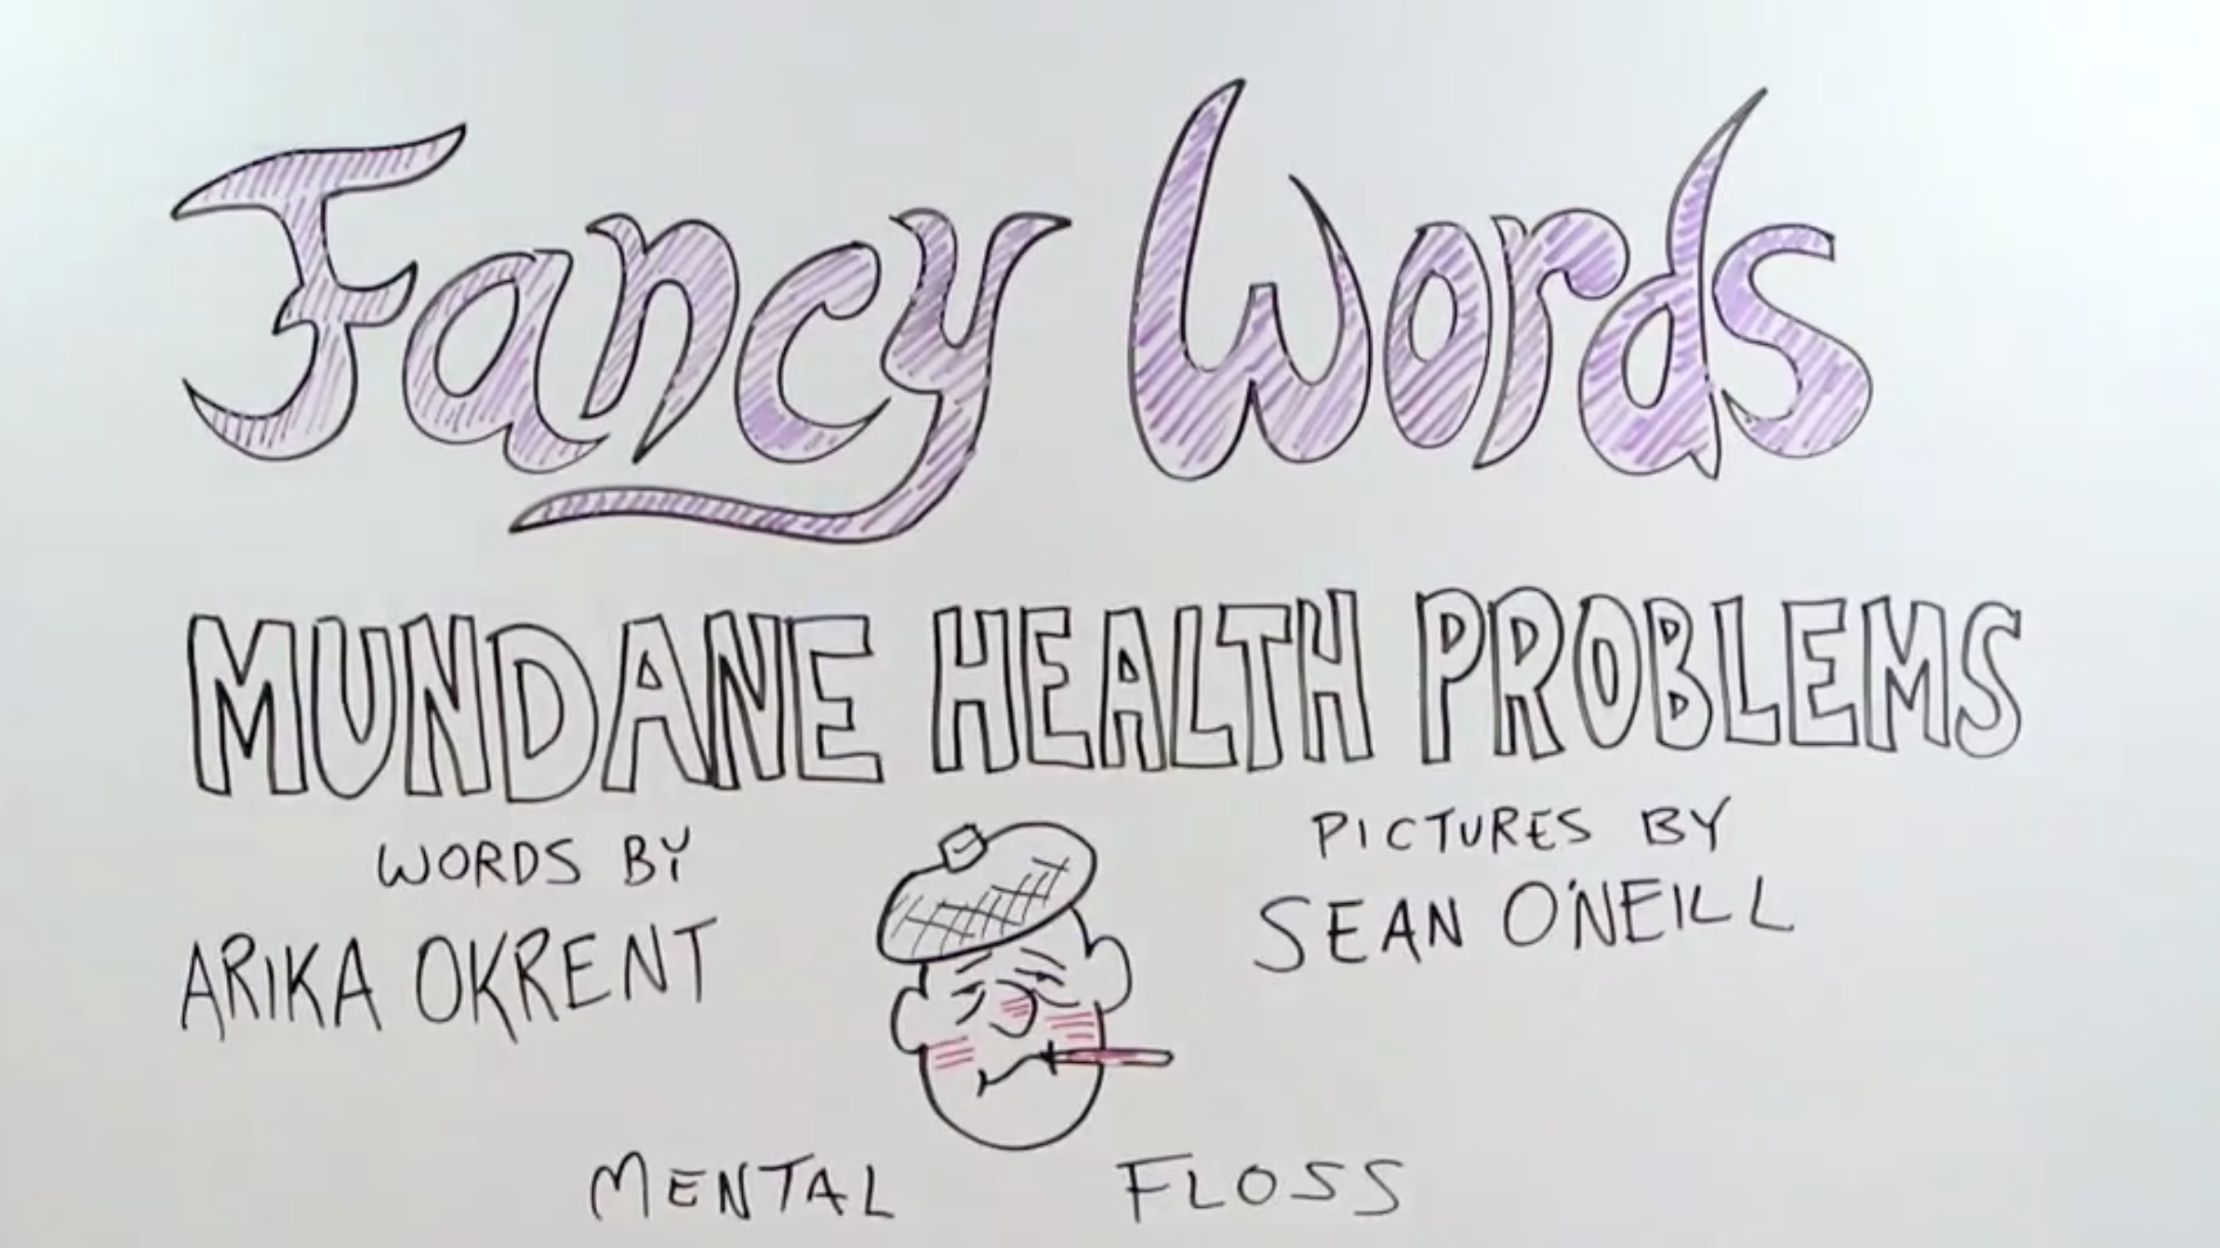 fancy words for mundane health problems